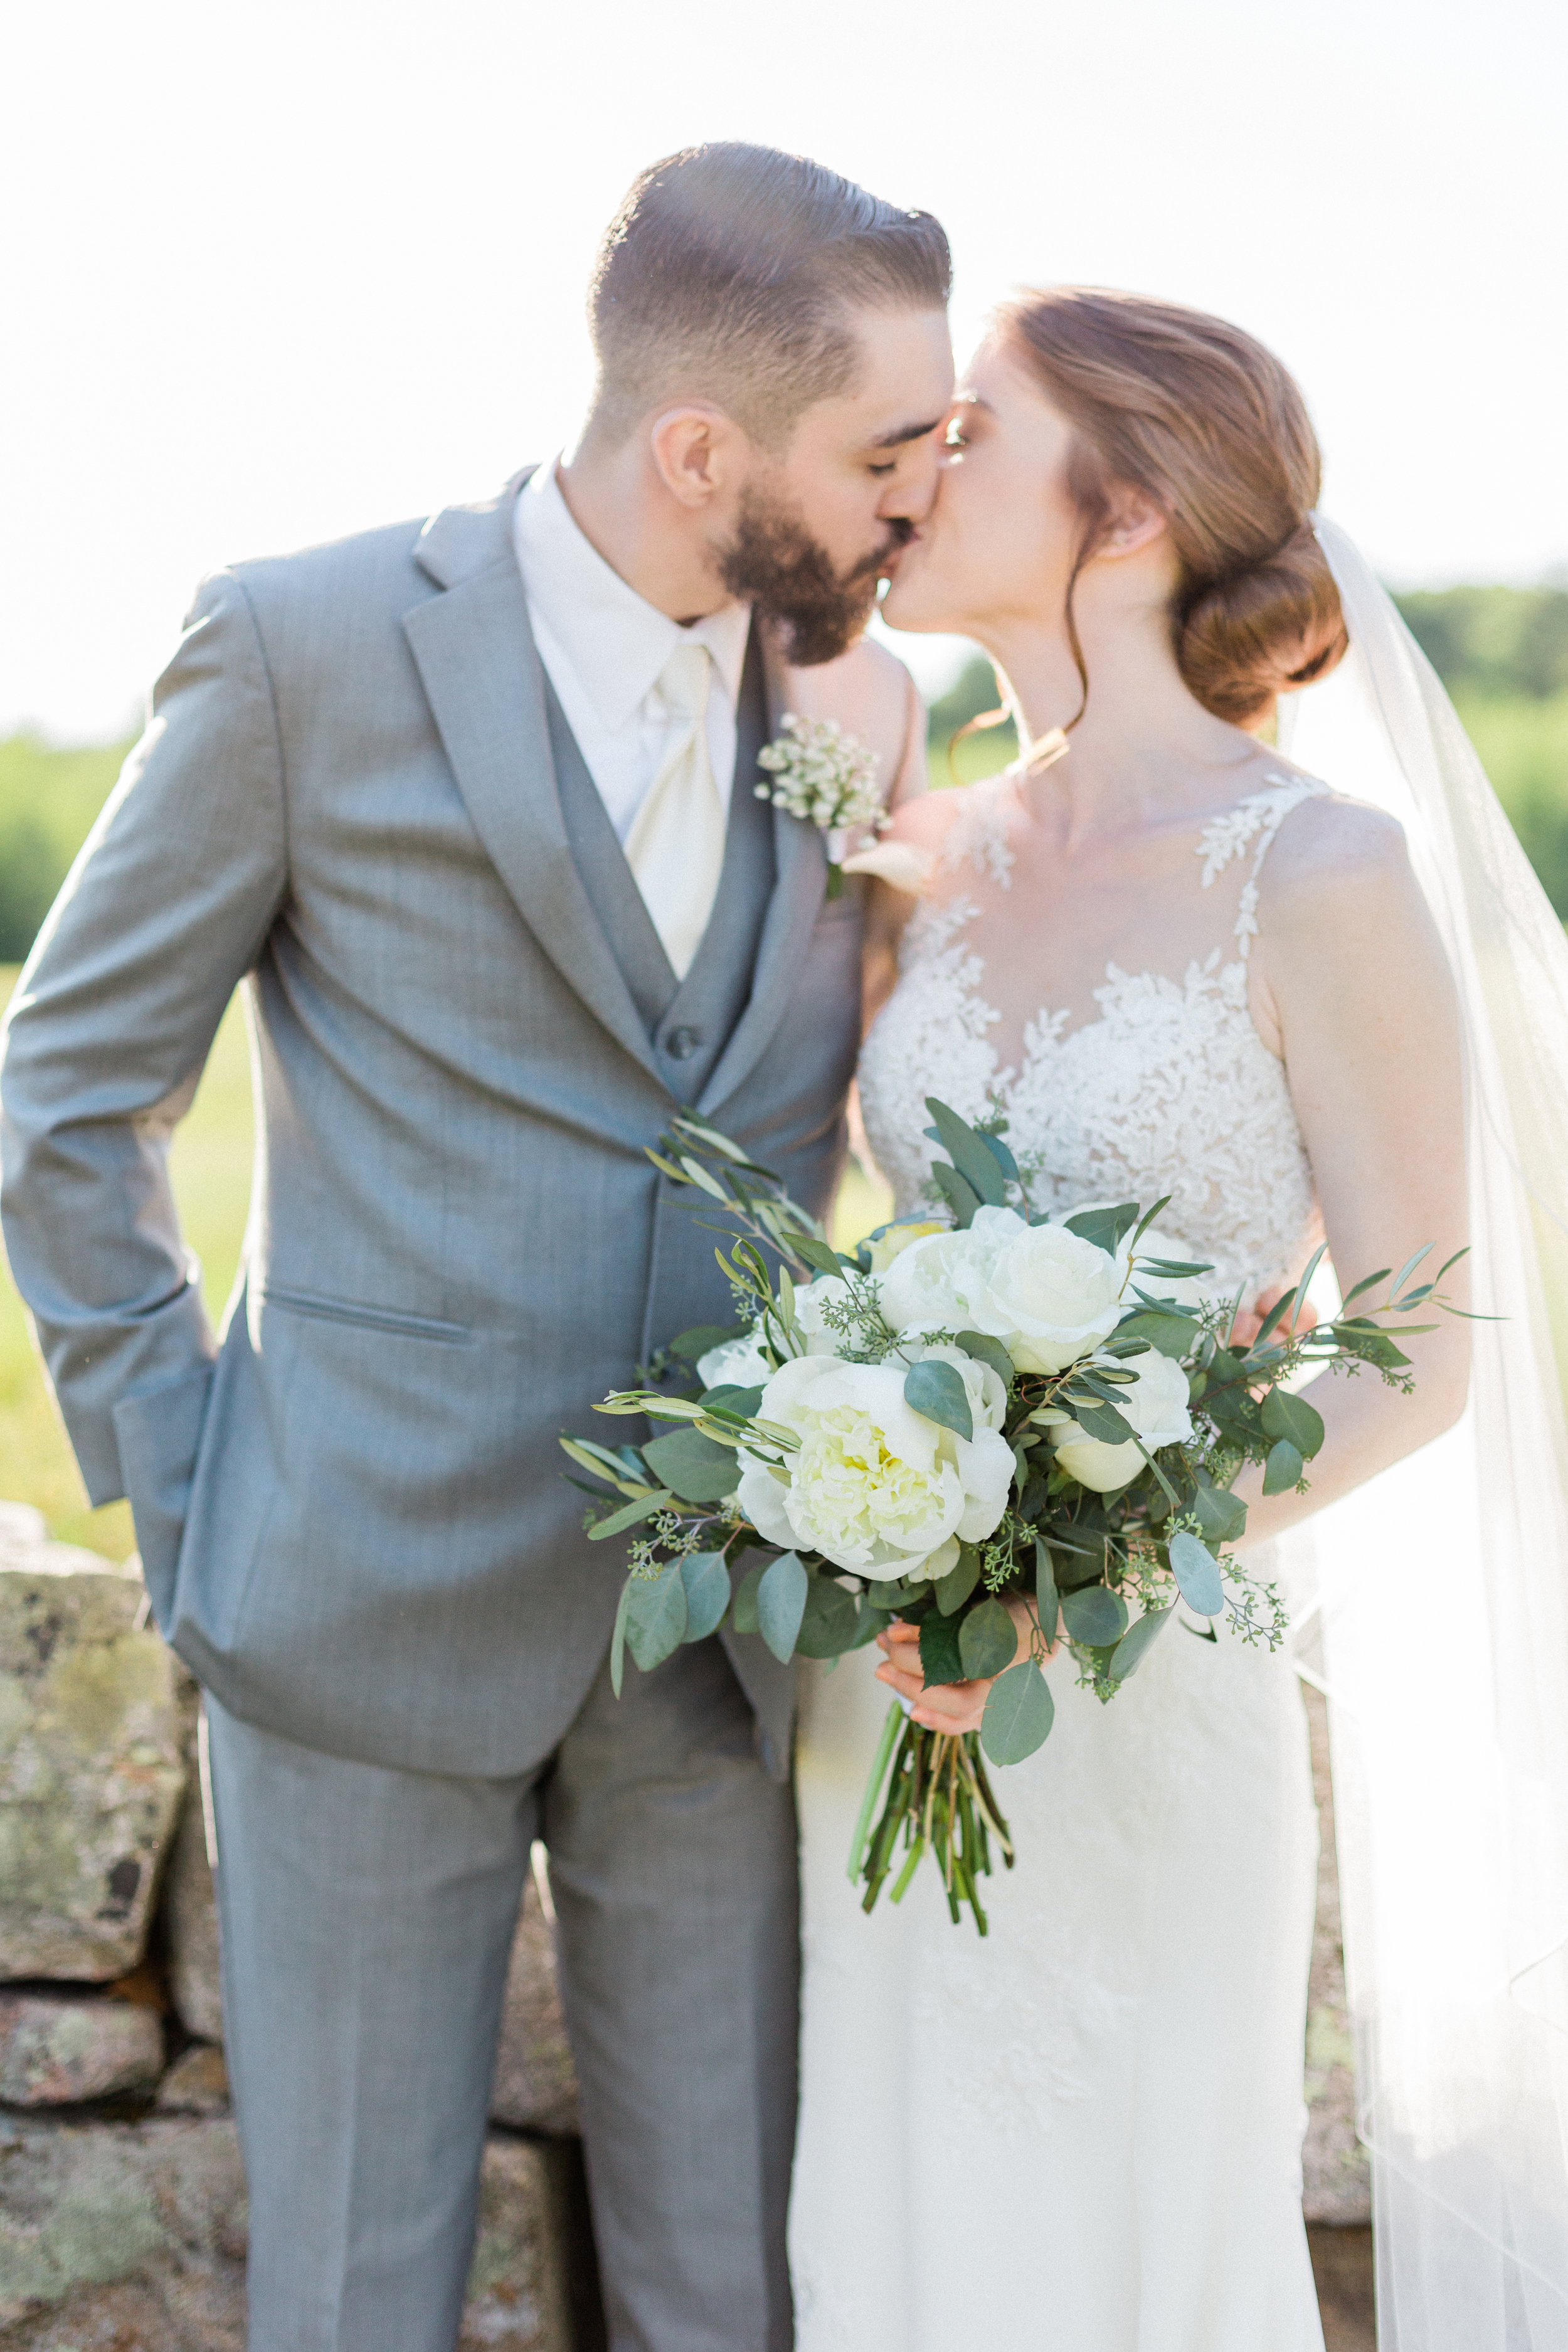 TravisAndBrennan_Wedding-4117.jpg